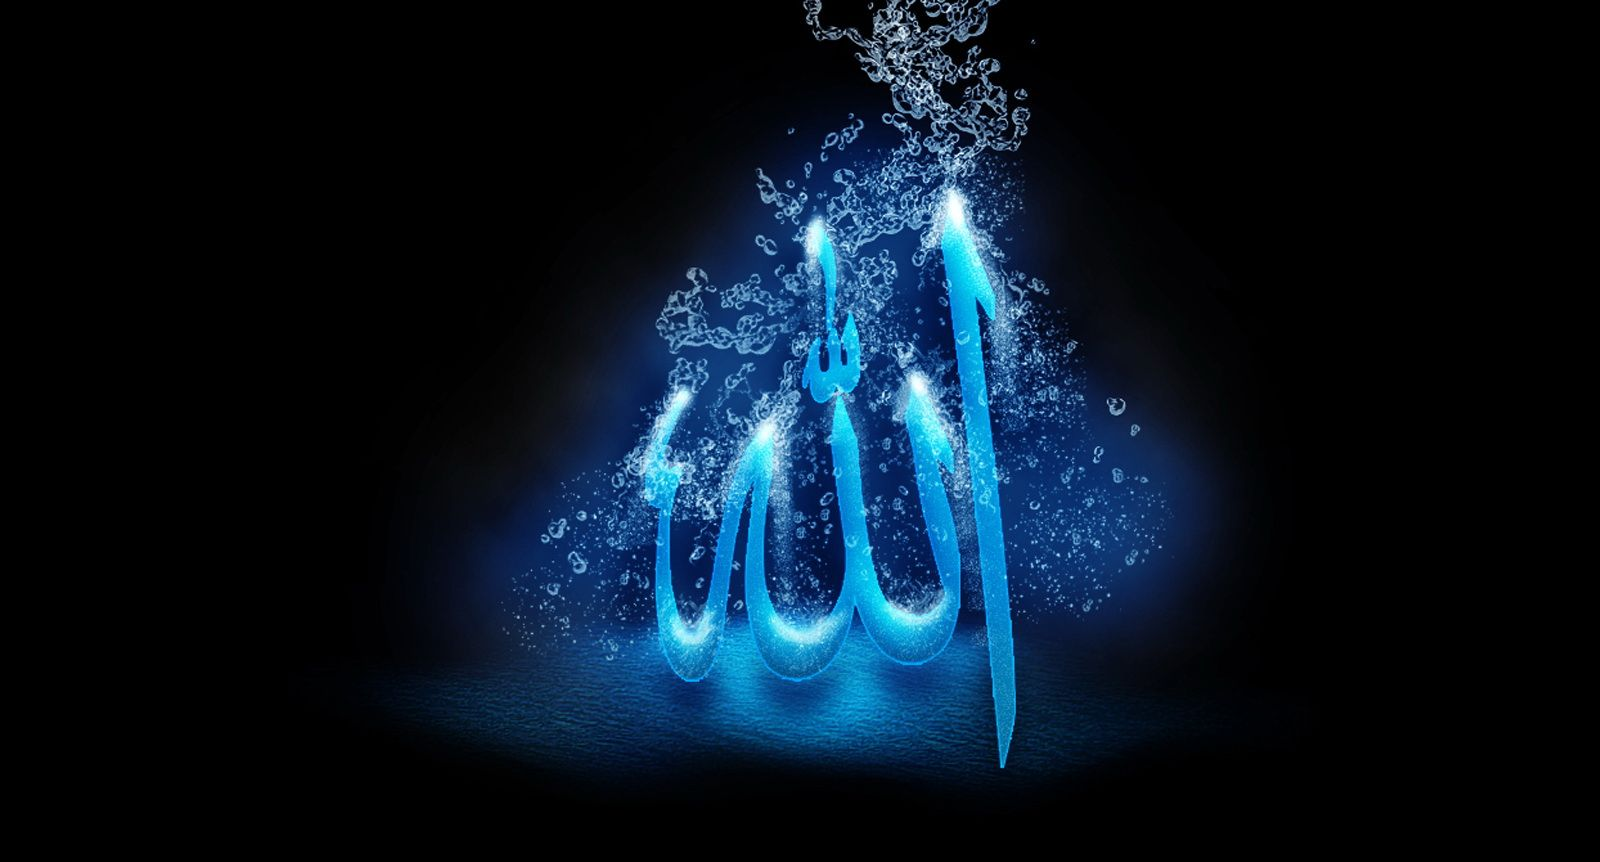 красивые картинки имена аллаха ?ис-туй?уларимизга